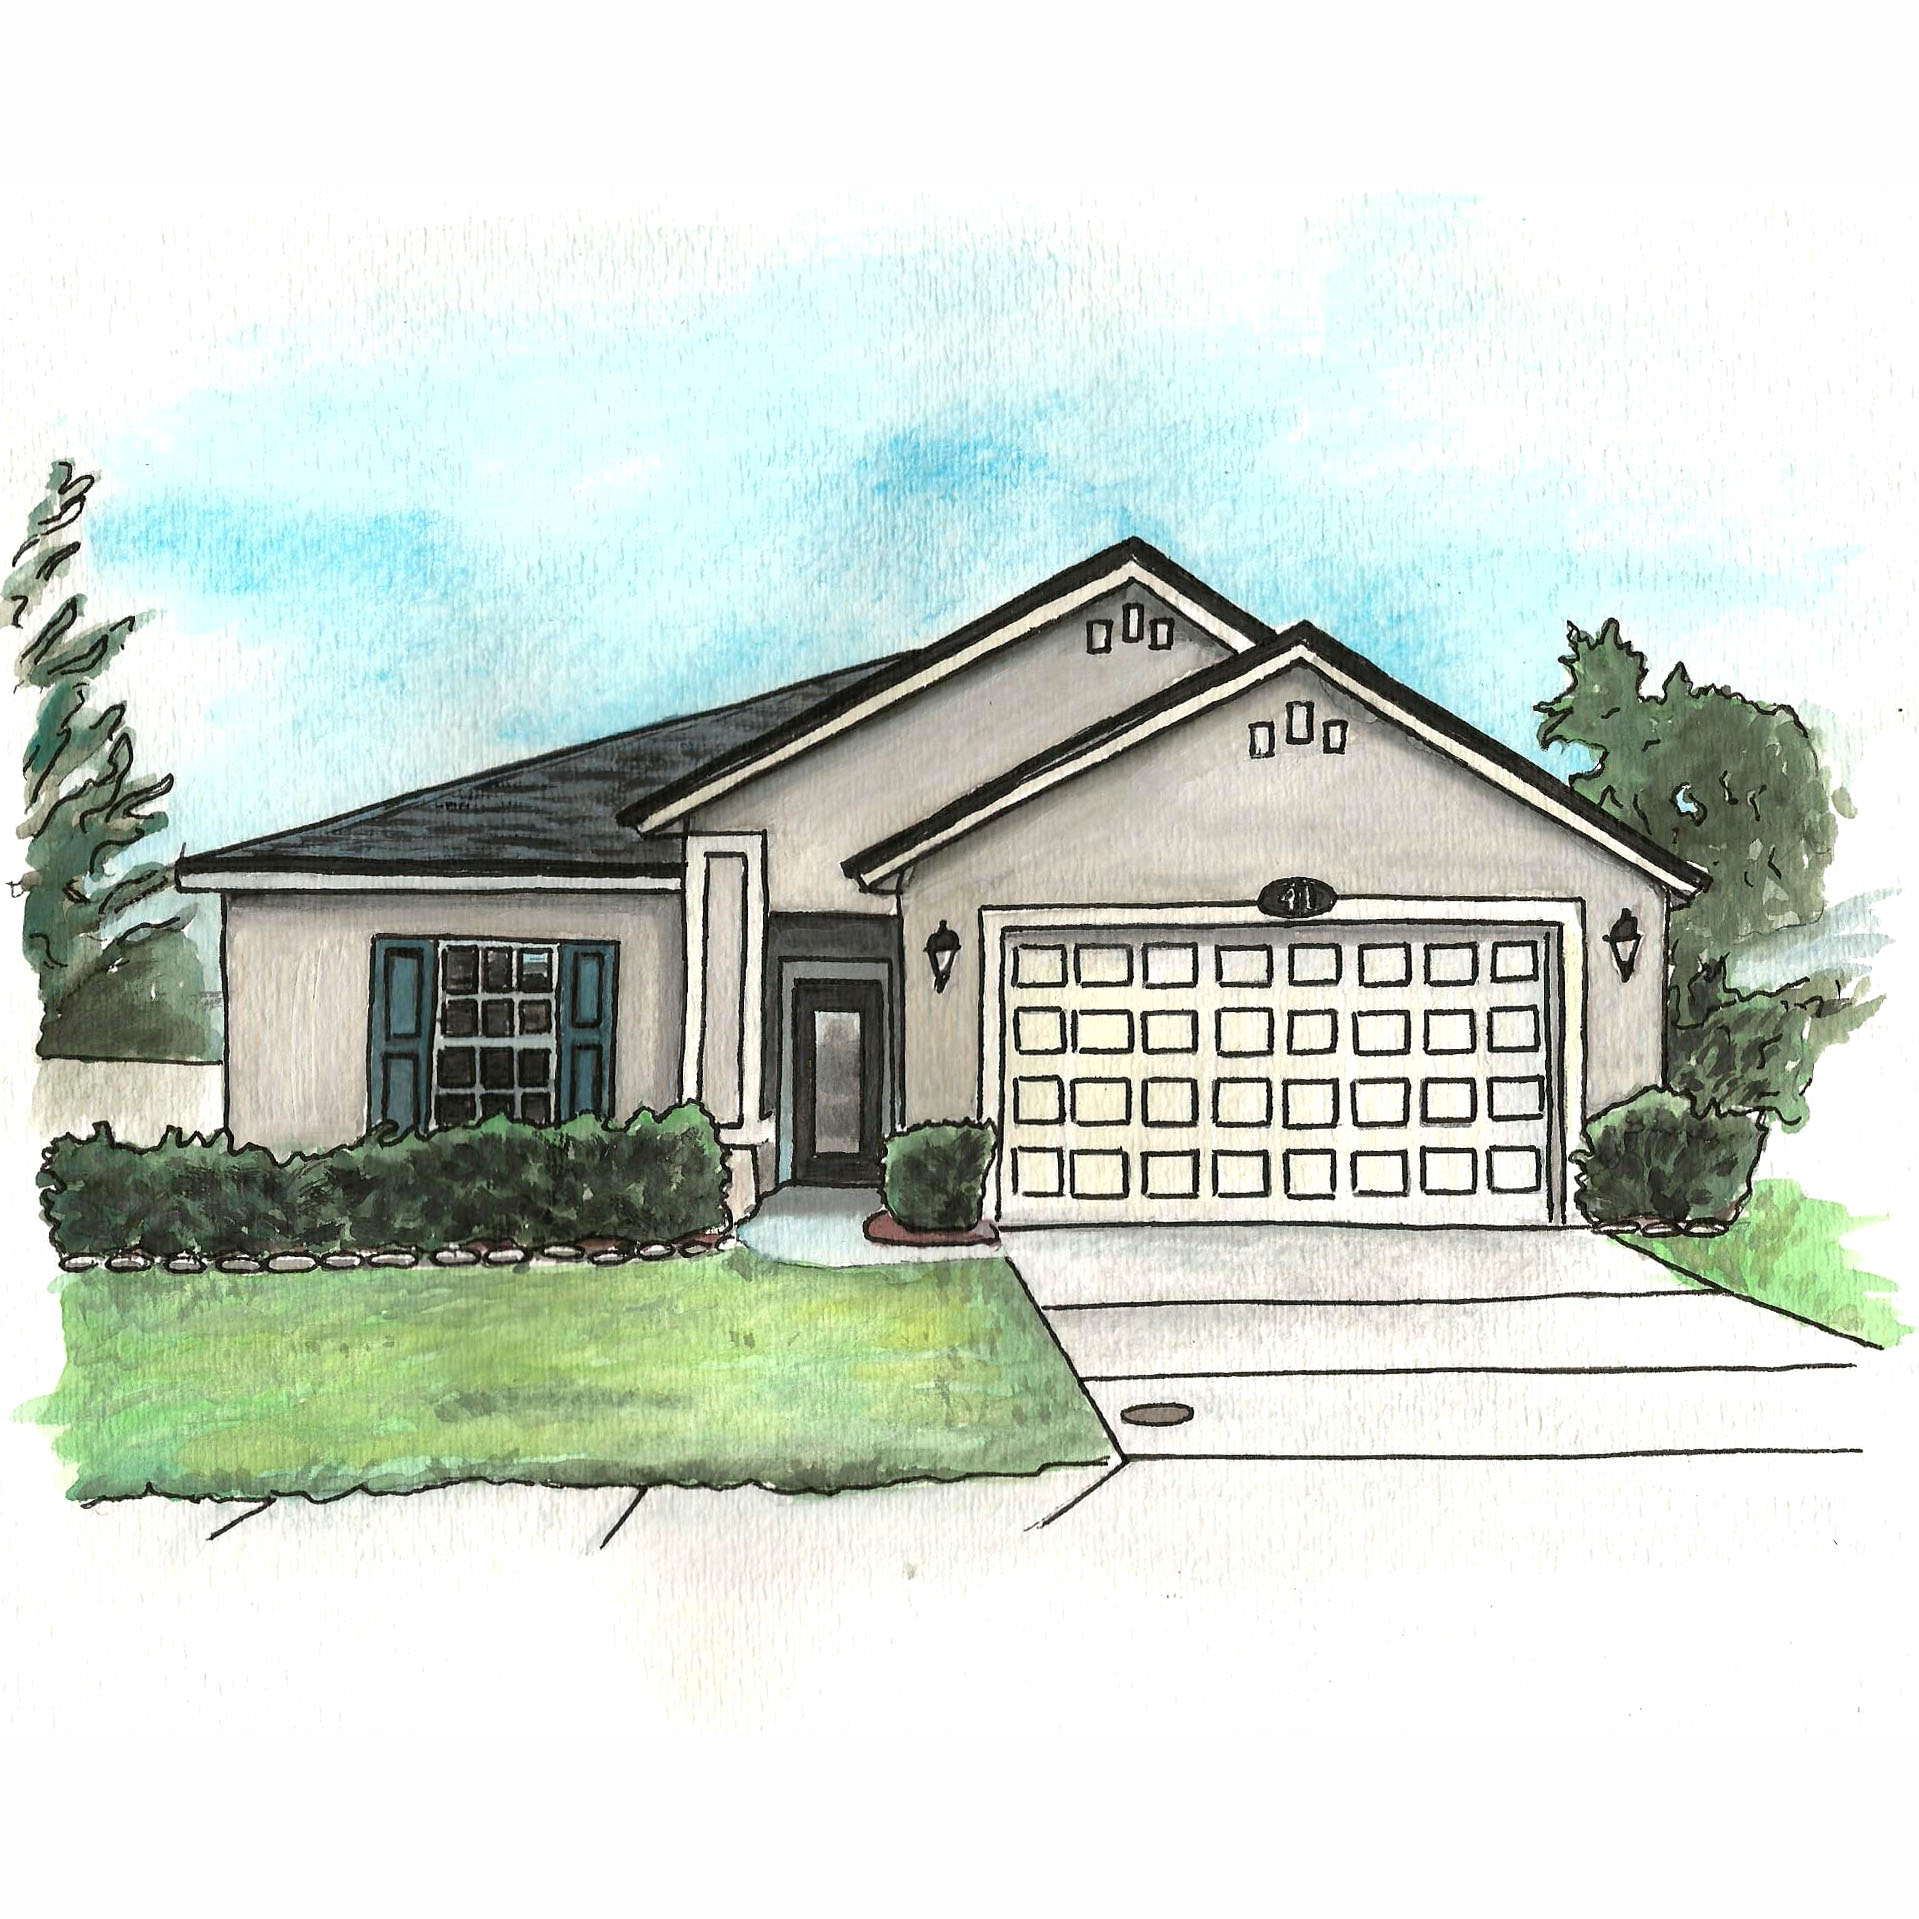 kiahs house painting.jpeg